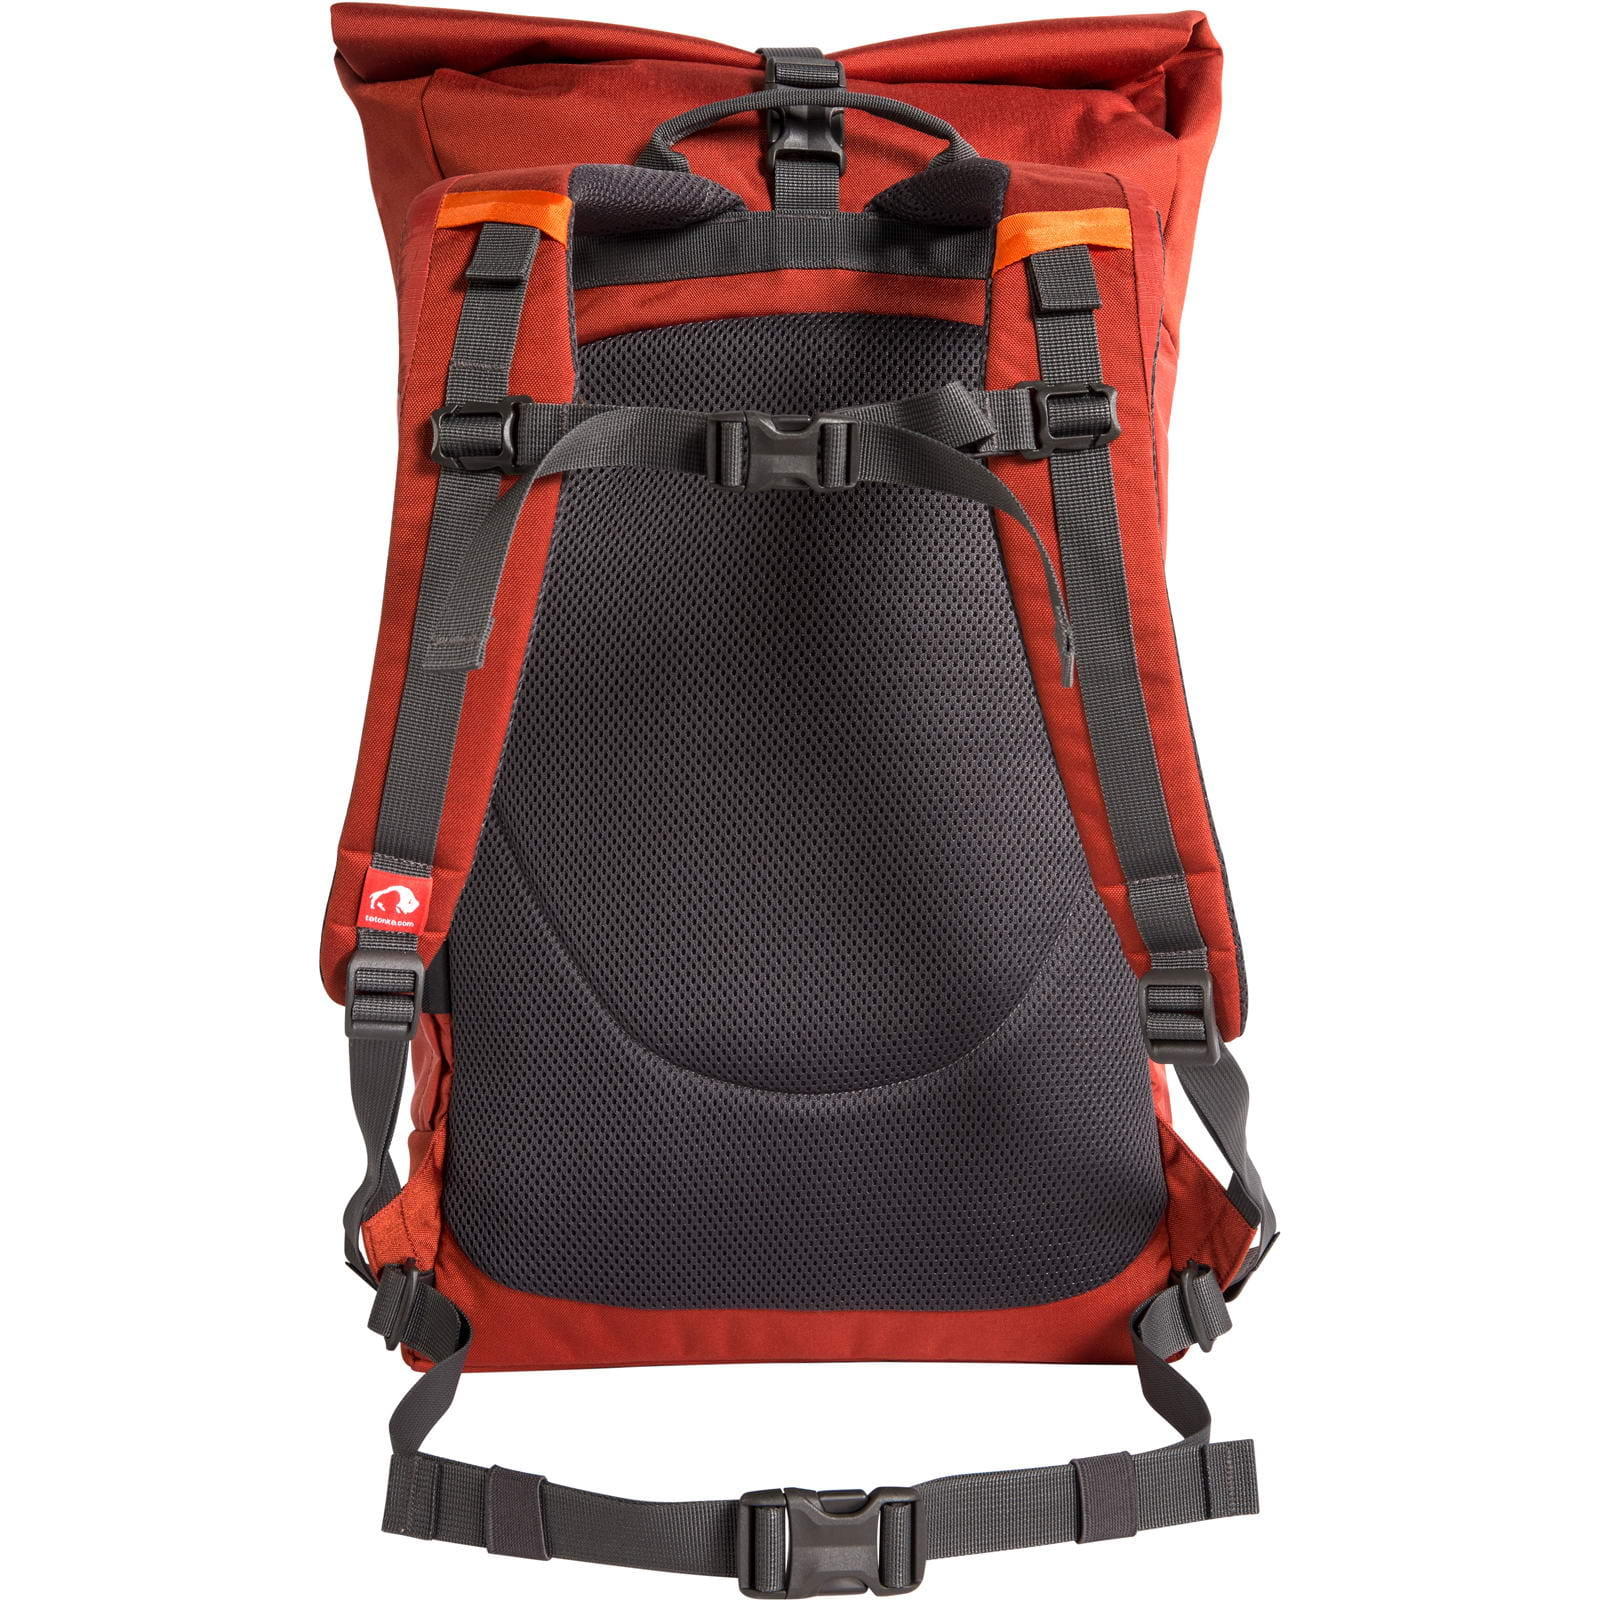 Tatonka Grip Rolltop Pack - Daypack redbrown - Bild 11